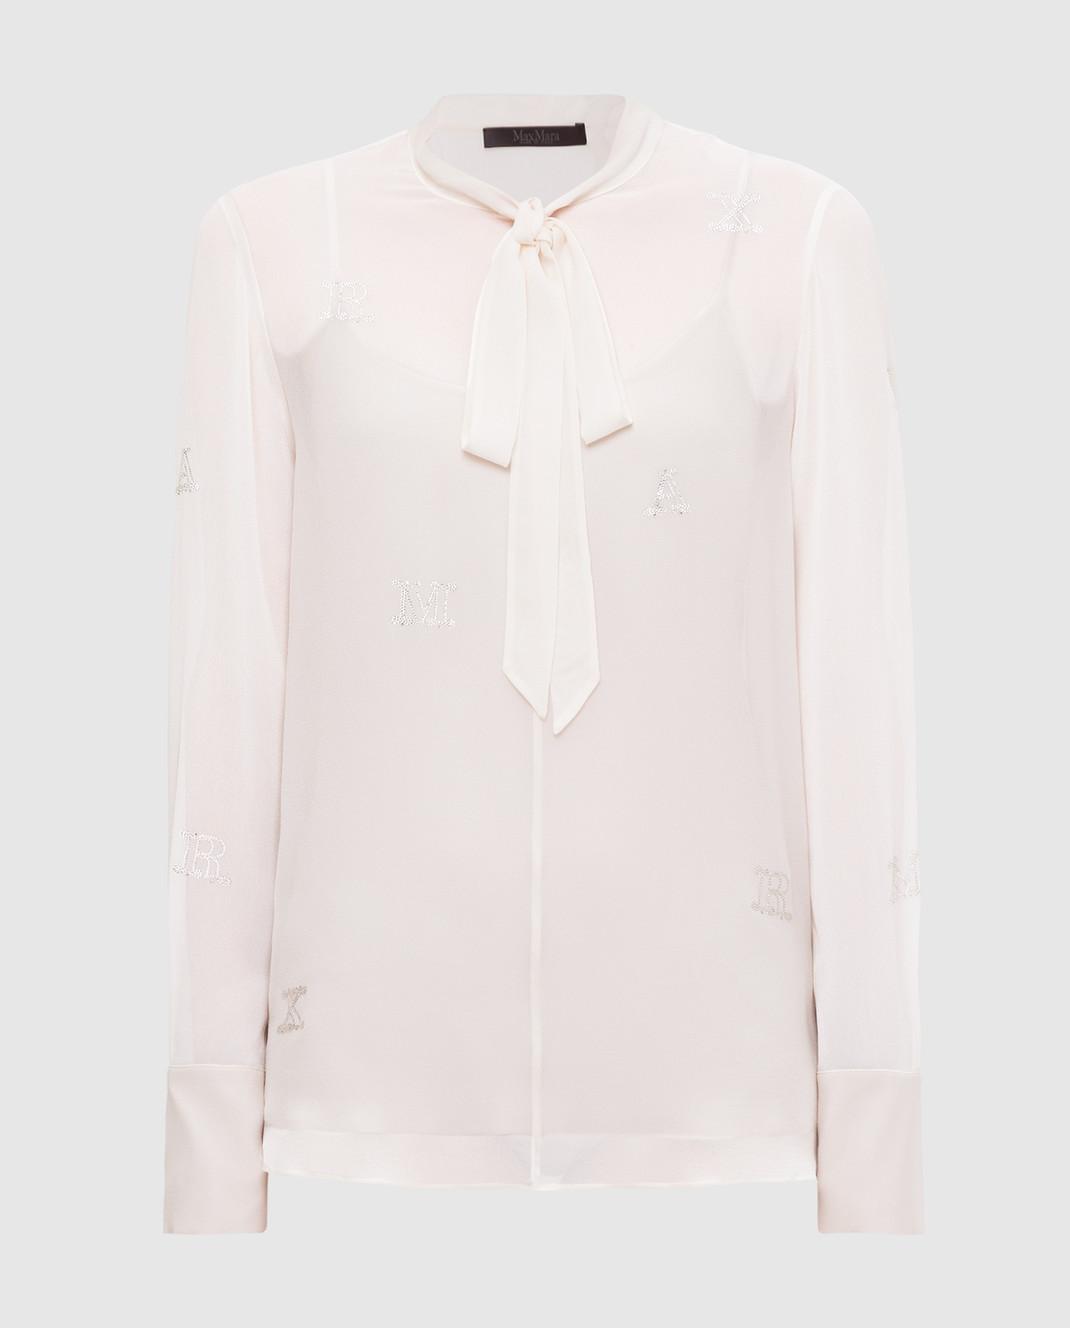 Max Mara Светло-бежевая блуза из шелка изображение 1